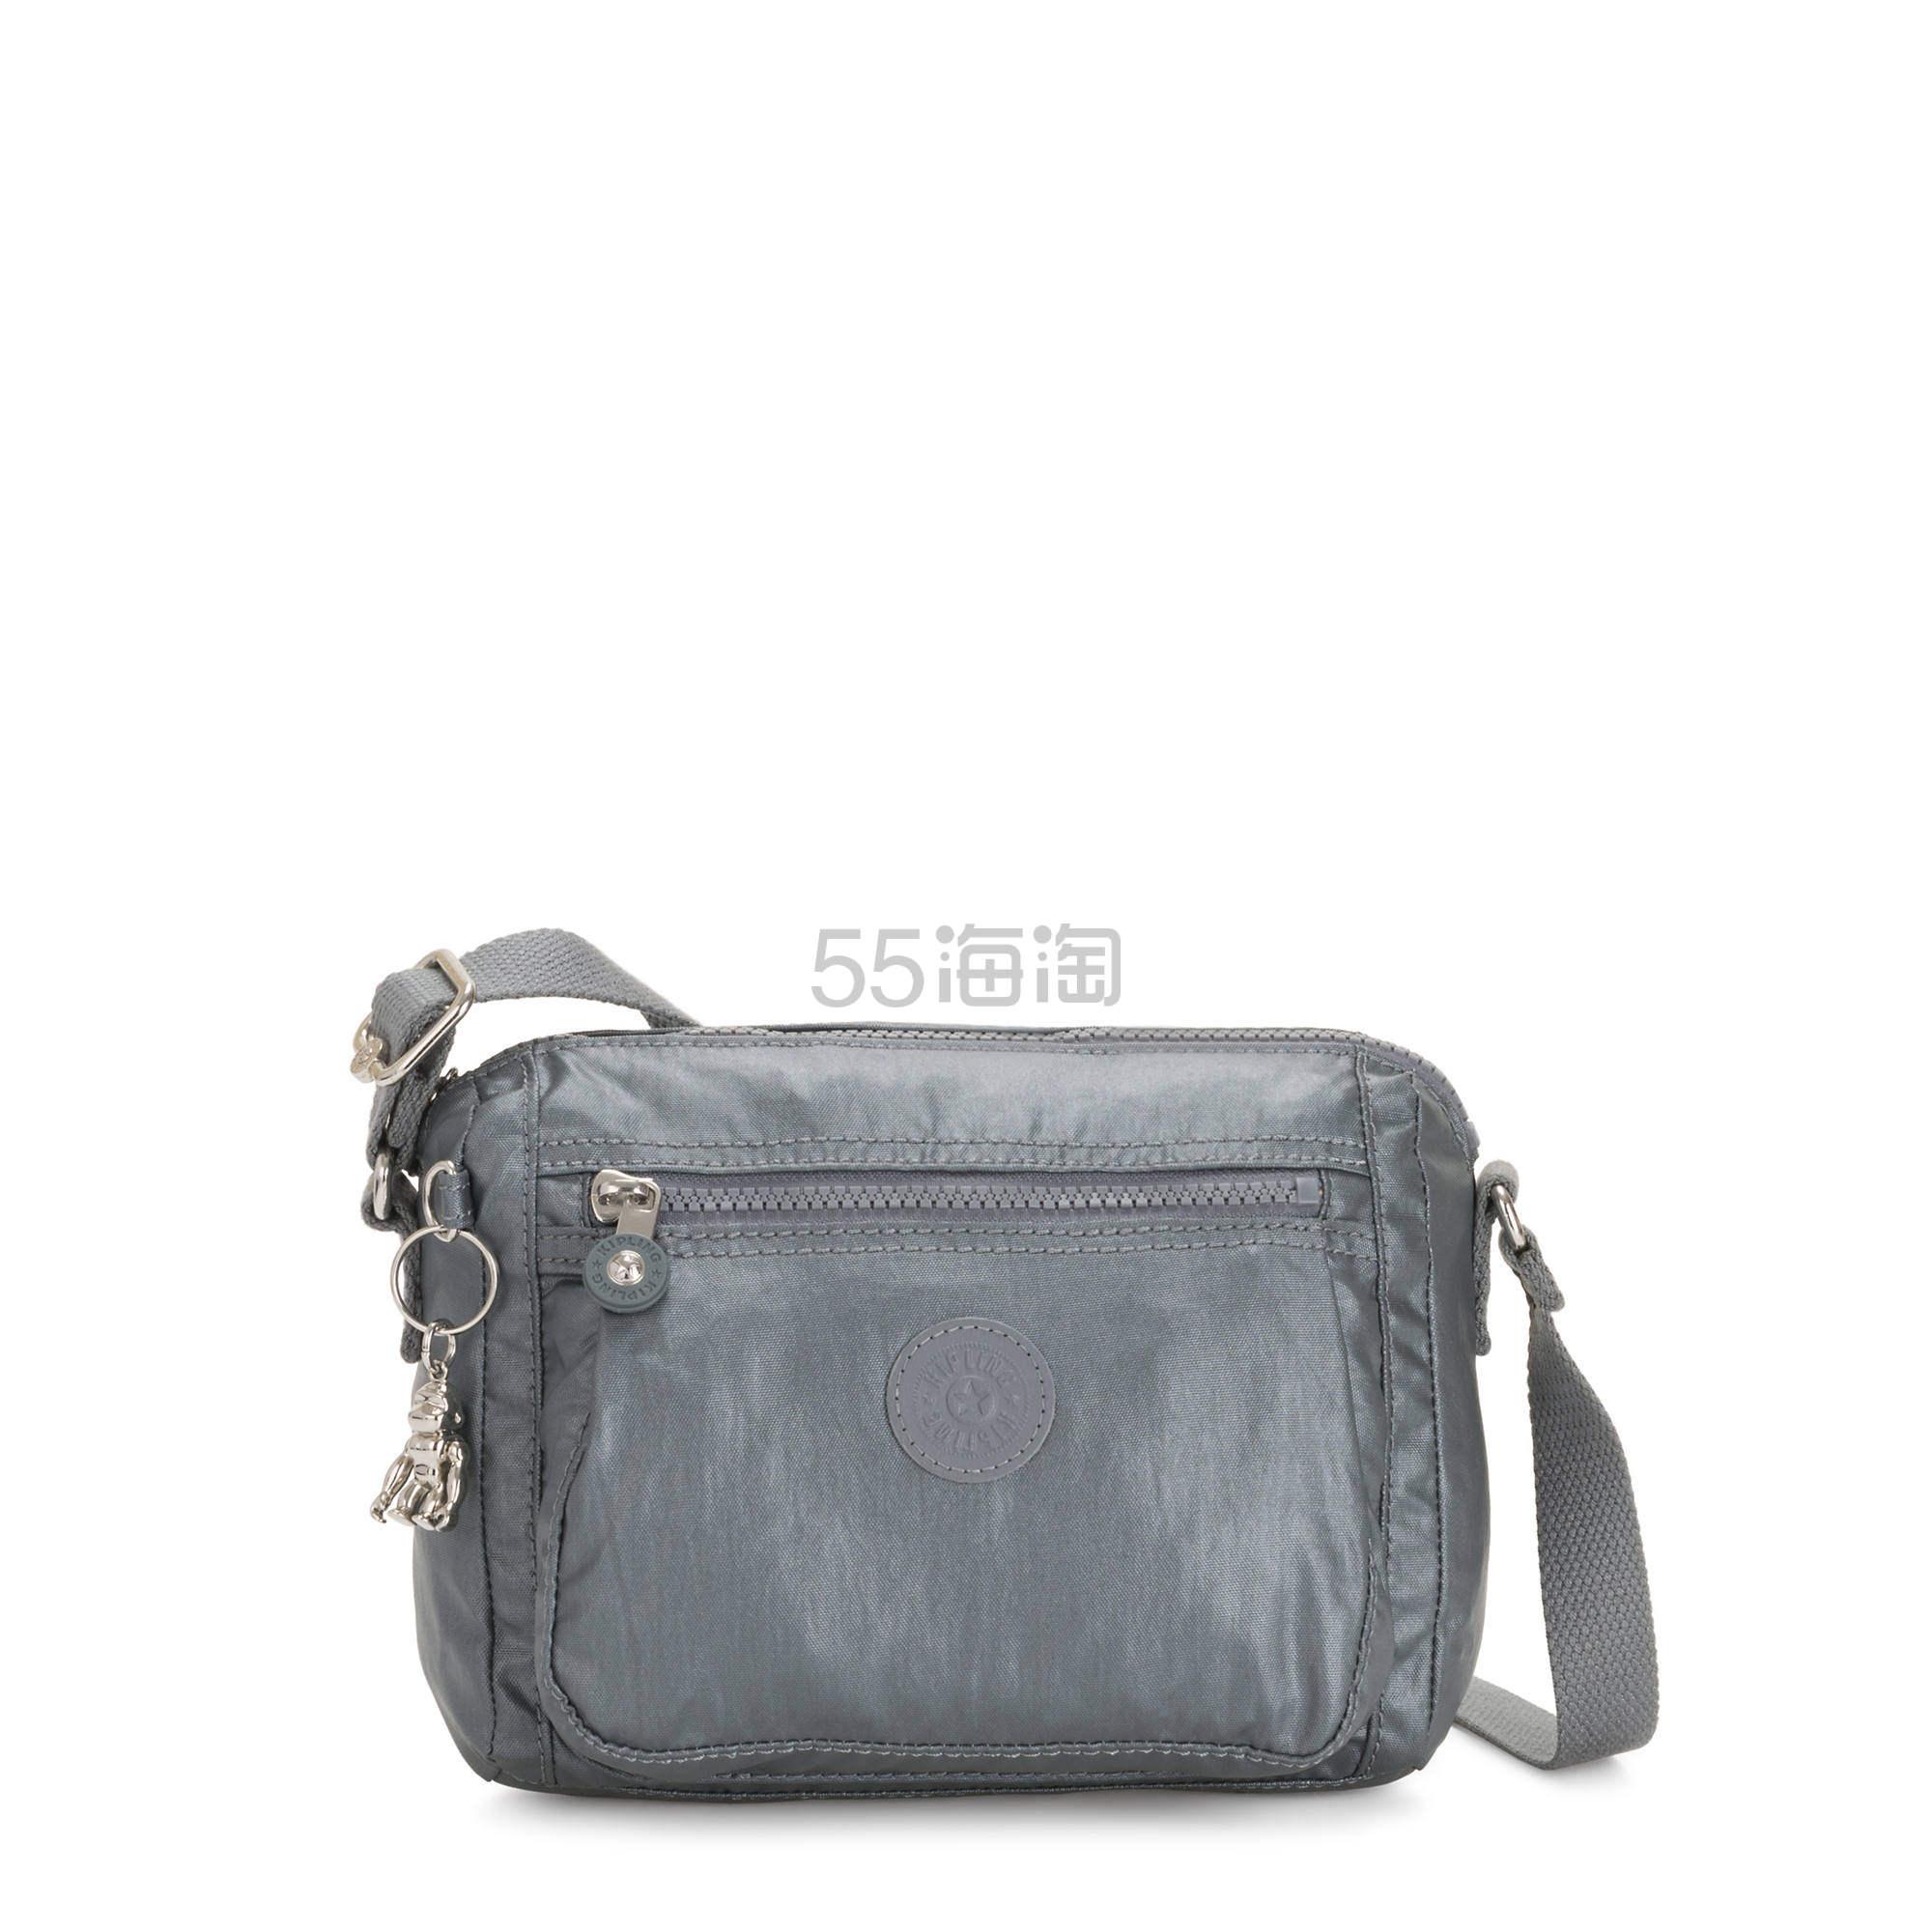 Kipling 吉普林官网 Chando 斜挎包 .99(约209元) - 海淘优惠海淘折扣|55海淘网